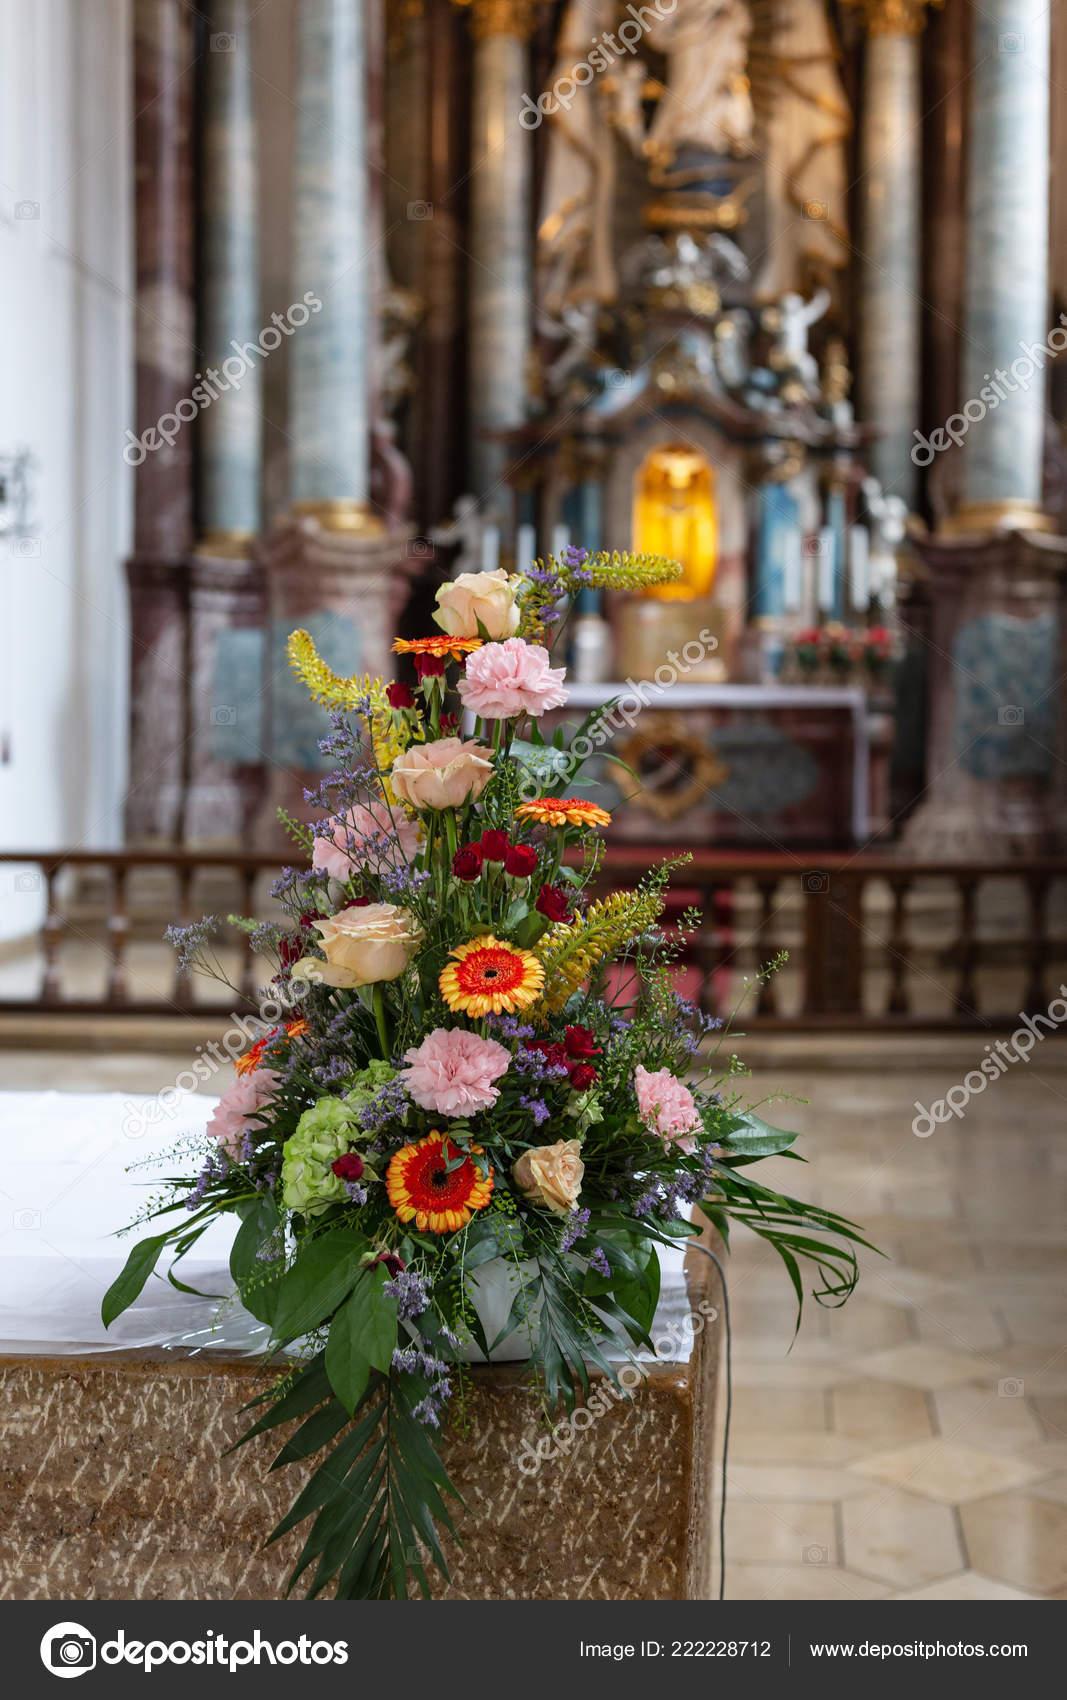 Church Altar Decoration With Flowers Flower Bouquet Church Altar Historical City South Germany Stock Photo C Rudolfgeiger 222228712